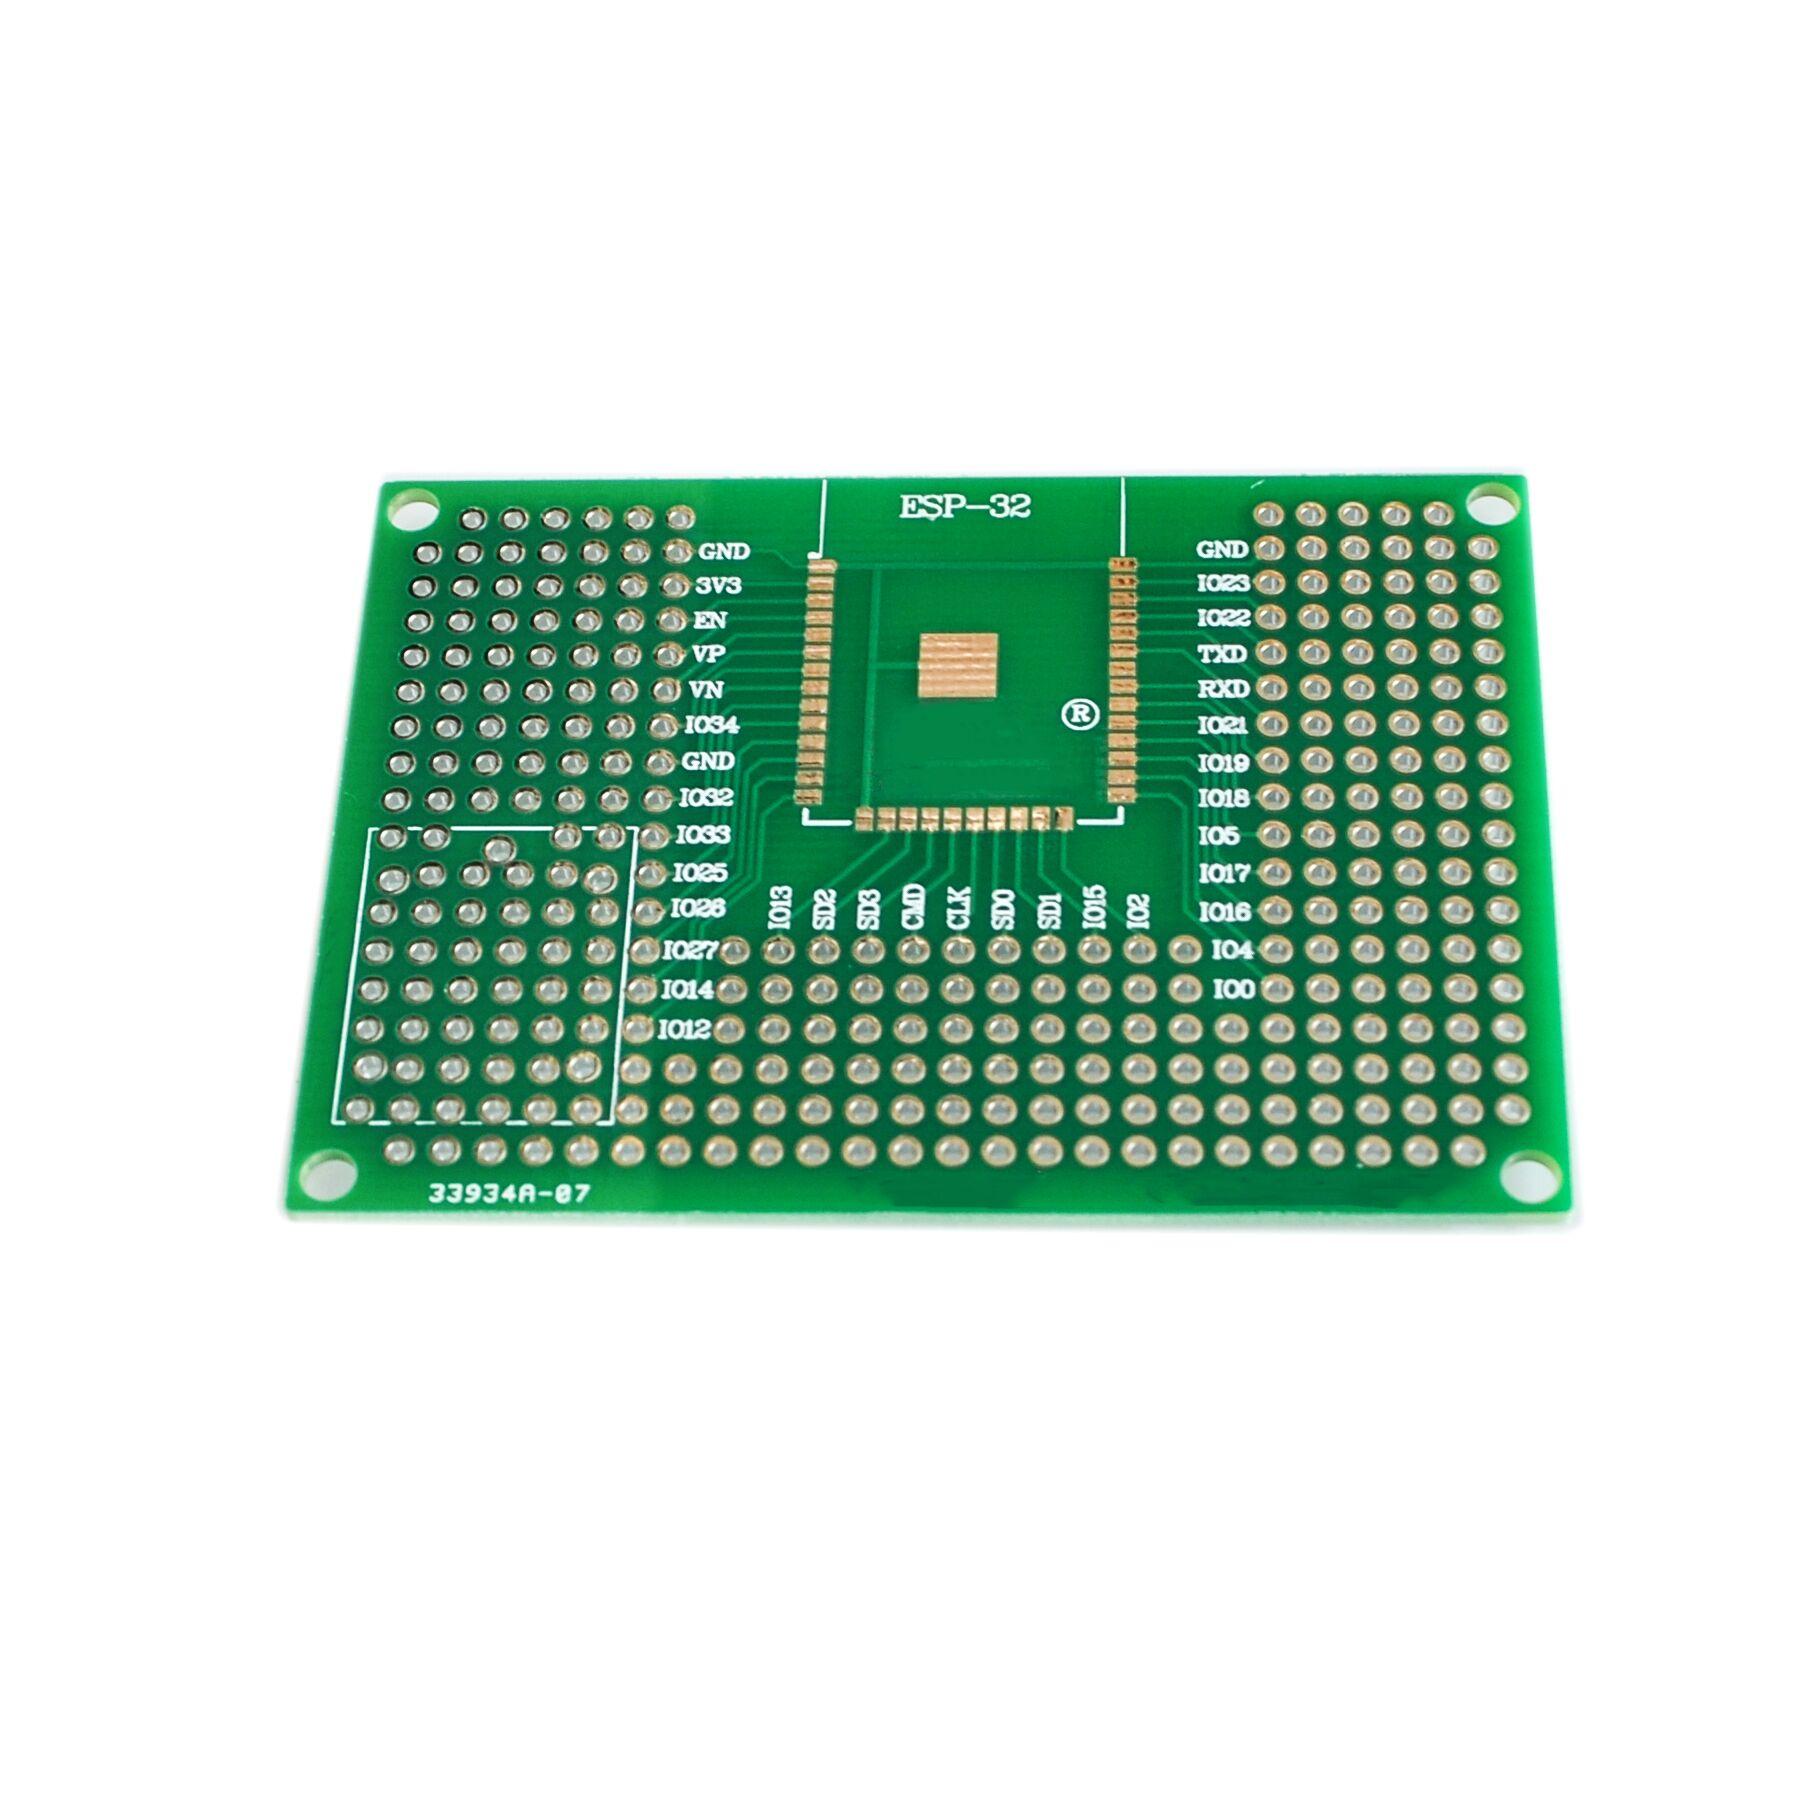 5X7 CM Doppel Side Prototyp PCB Steckbrett Universal-Board Für UNO R3 ESP8266 WIFI ESP-12F ESP-12E ESP32S ESP32 50x70mm